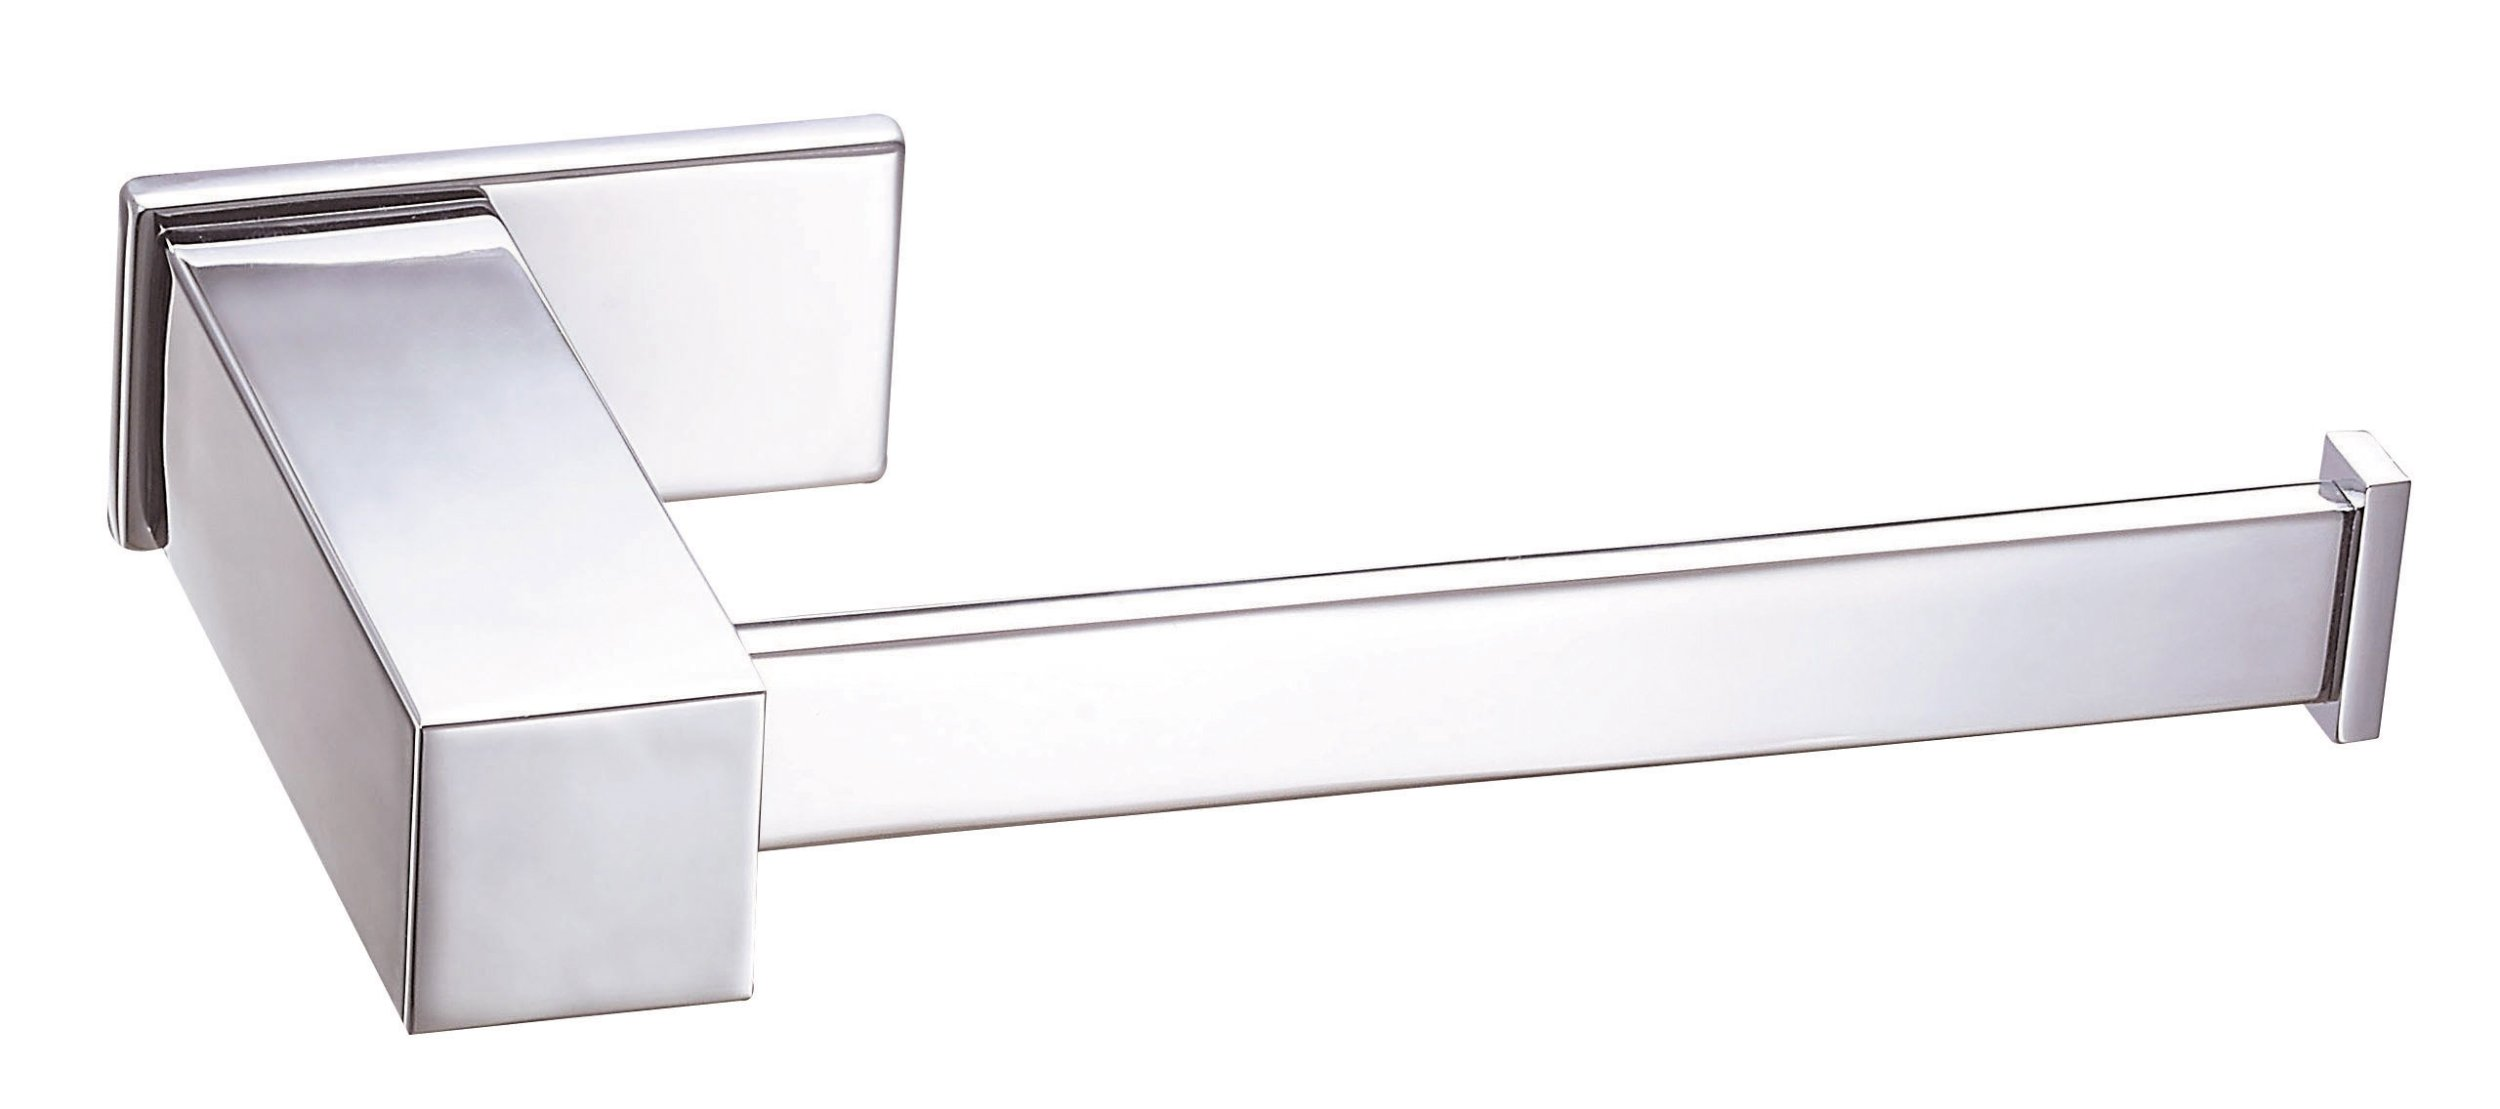 Danze D446136 Sirius Eurostyle Paper Holder or Towel Bar, Chrome